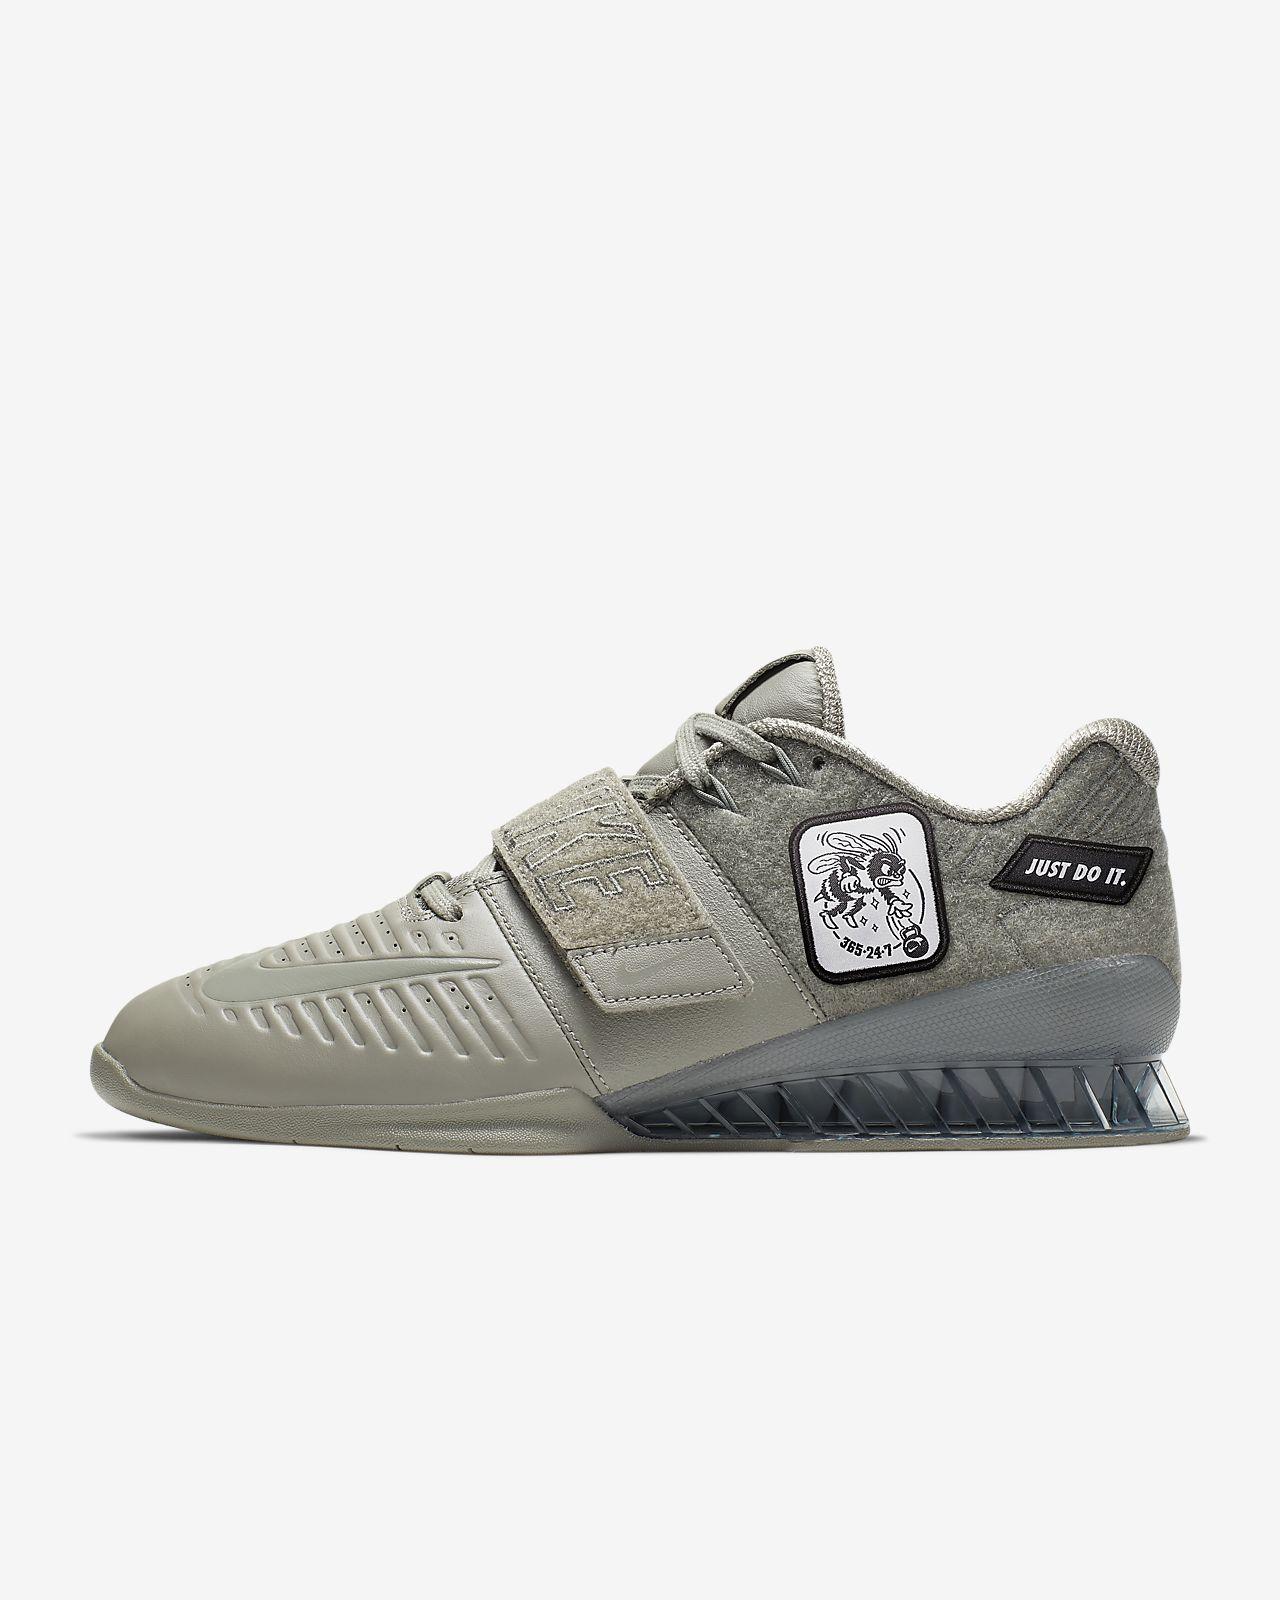 Nike Romaleos 3 XD Patch Training Shoe